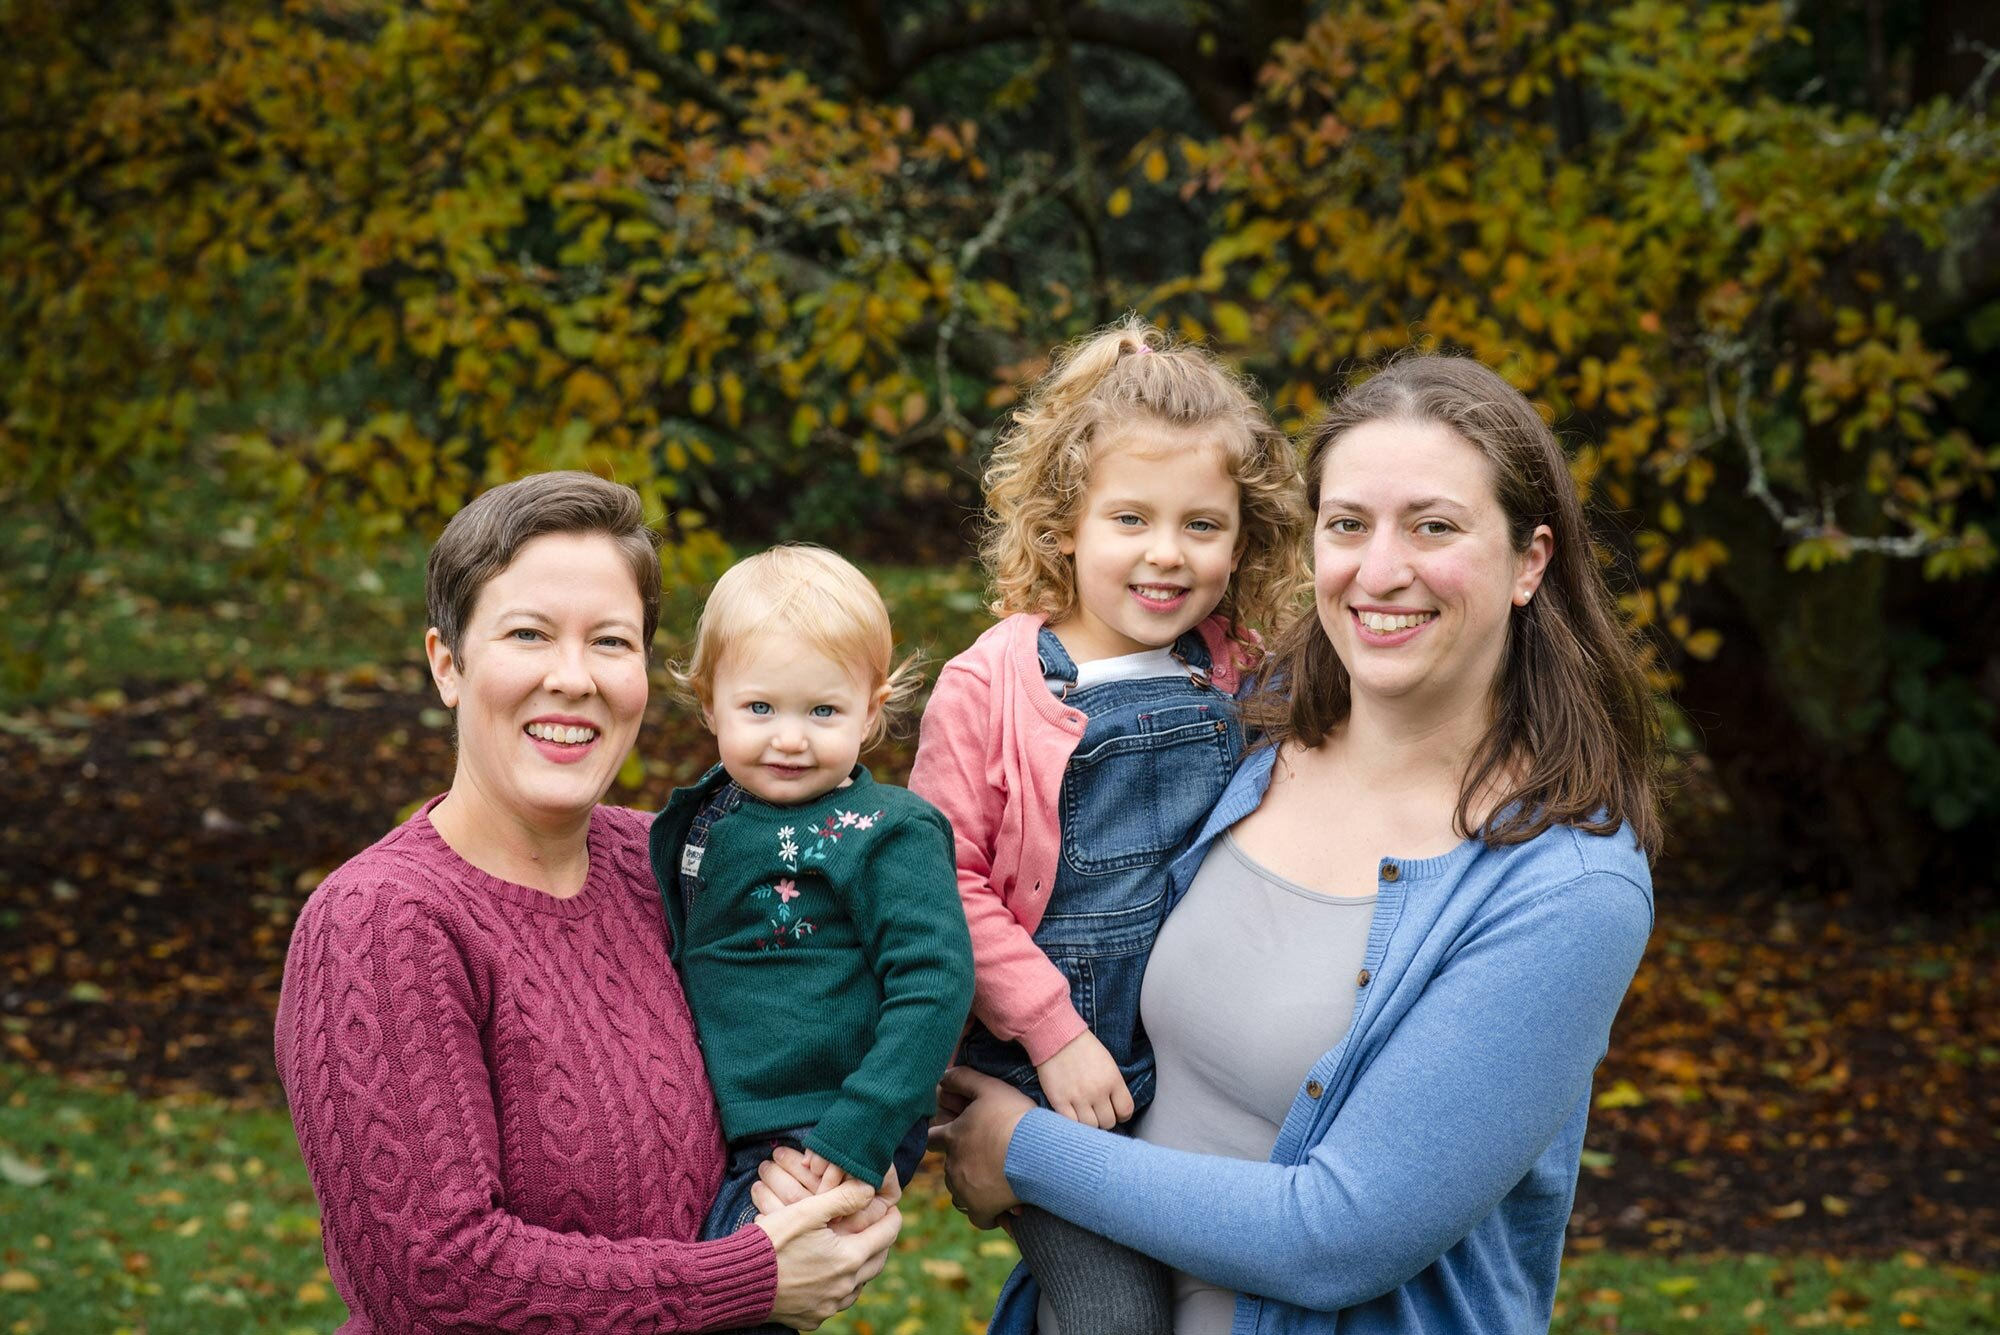 web_2018-10-28+Waldman-Stroessner+Family_004.jpg